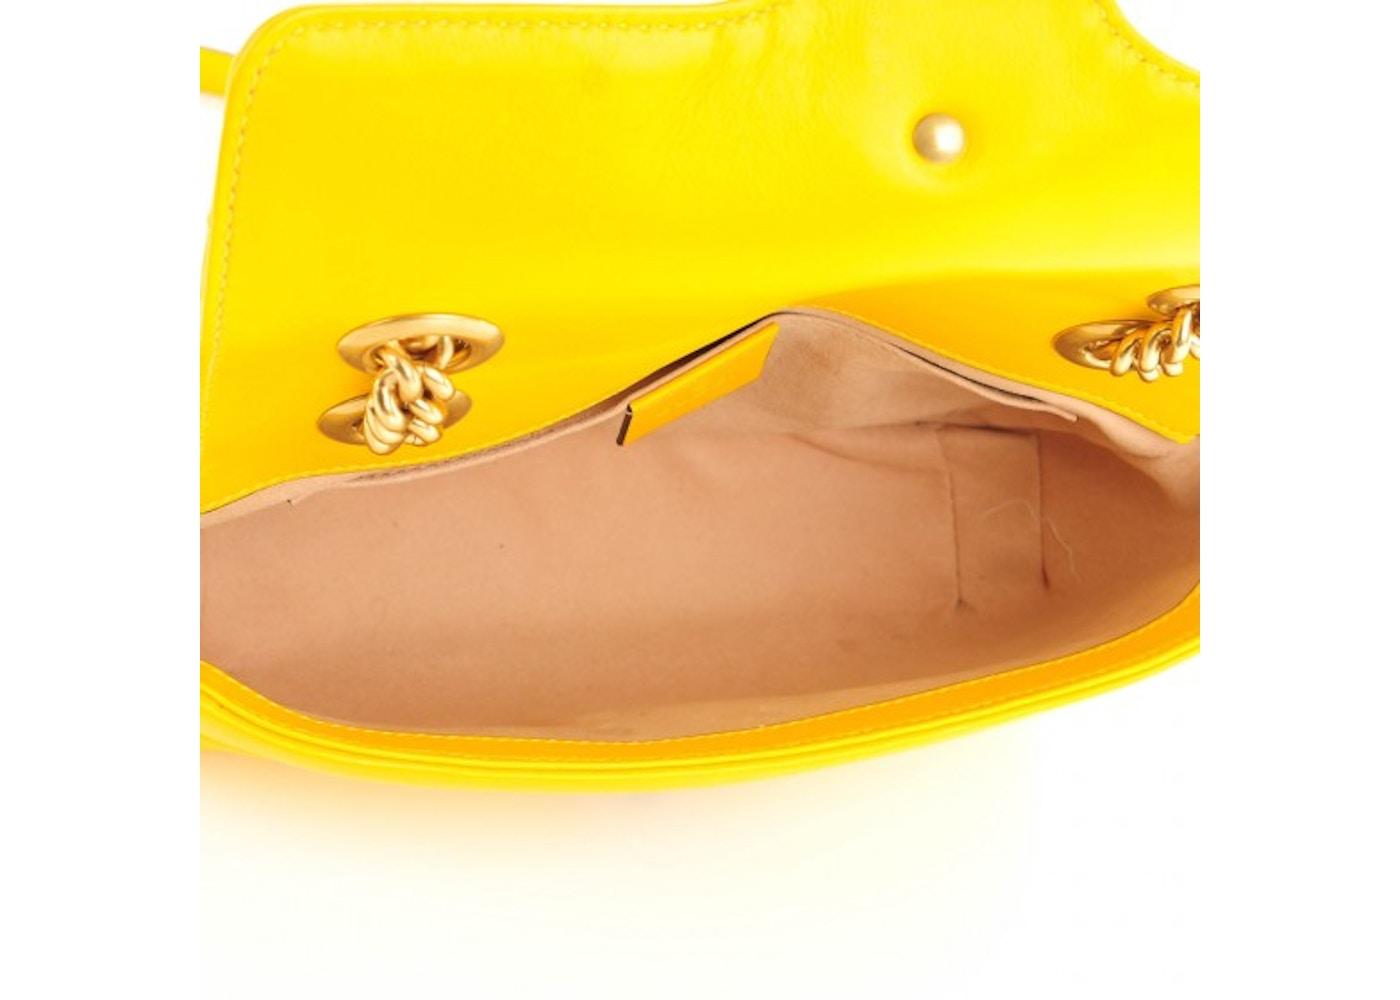 6b85a32fbe5c Gucci Marmont Shoulder Matelasse Mini Yellow